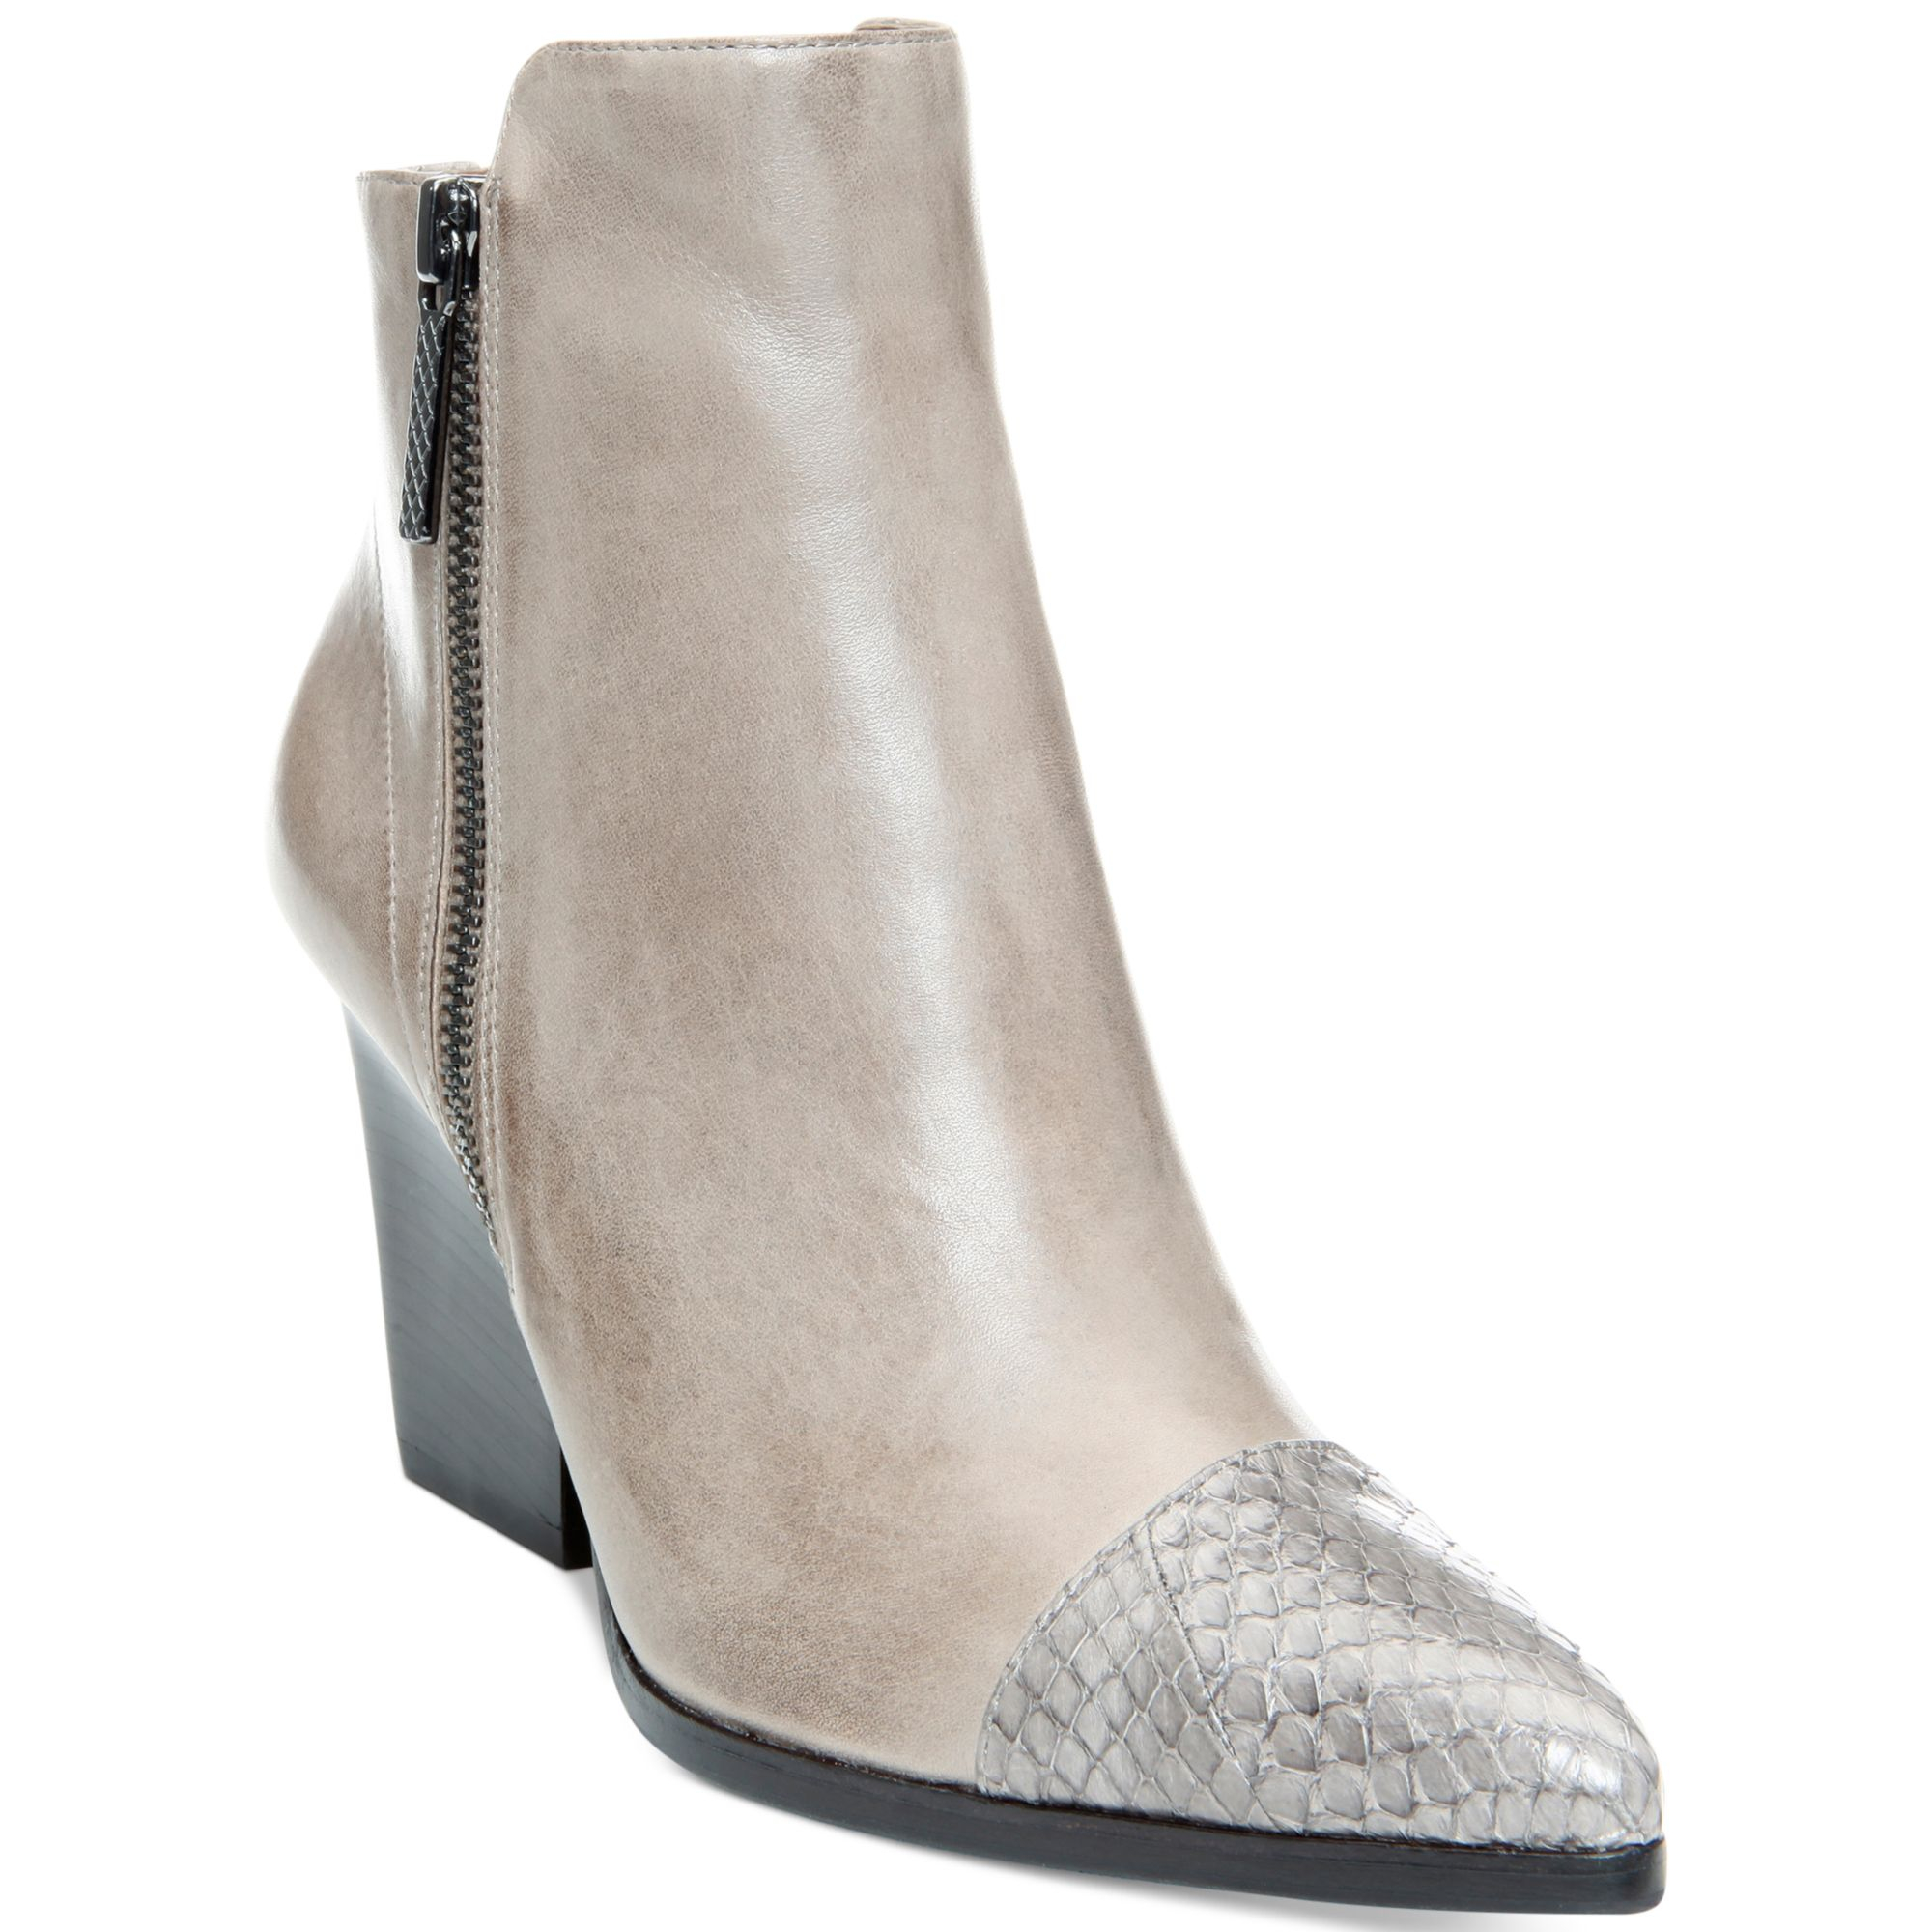 Donald J Pliner Womens Volt Leather Closed Toe Ankle Fashion Boots by Donald J Pliner